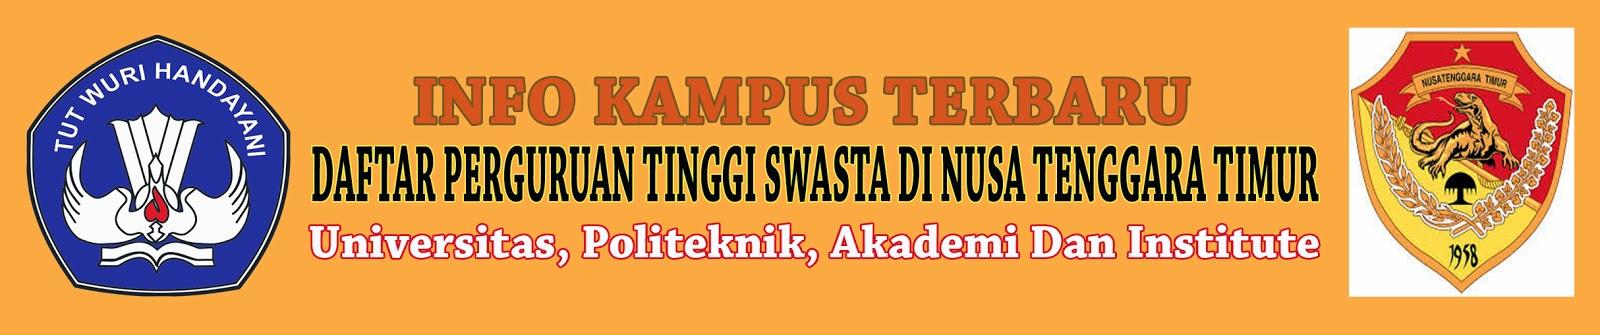 Daftar Perguruan Tinggi Swasta Di Nusa Tenggara Timur